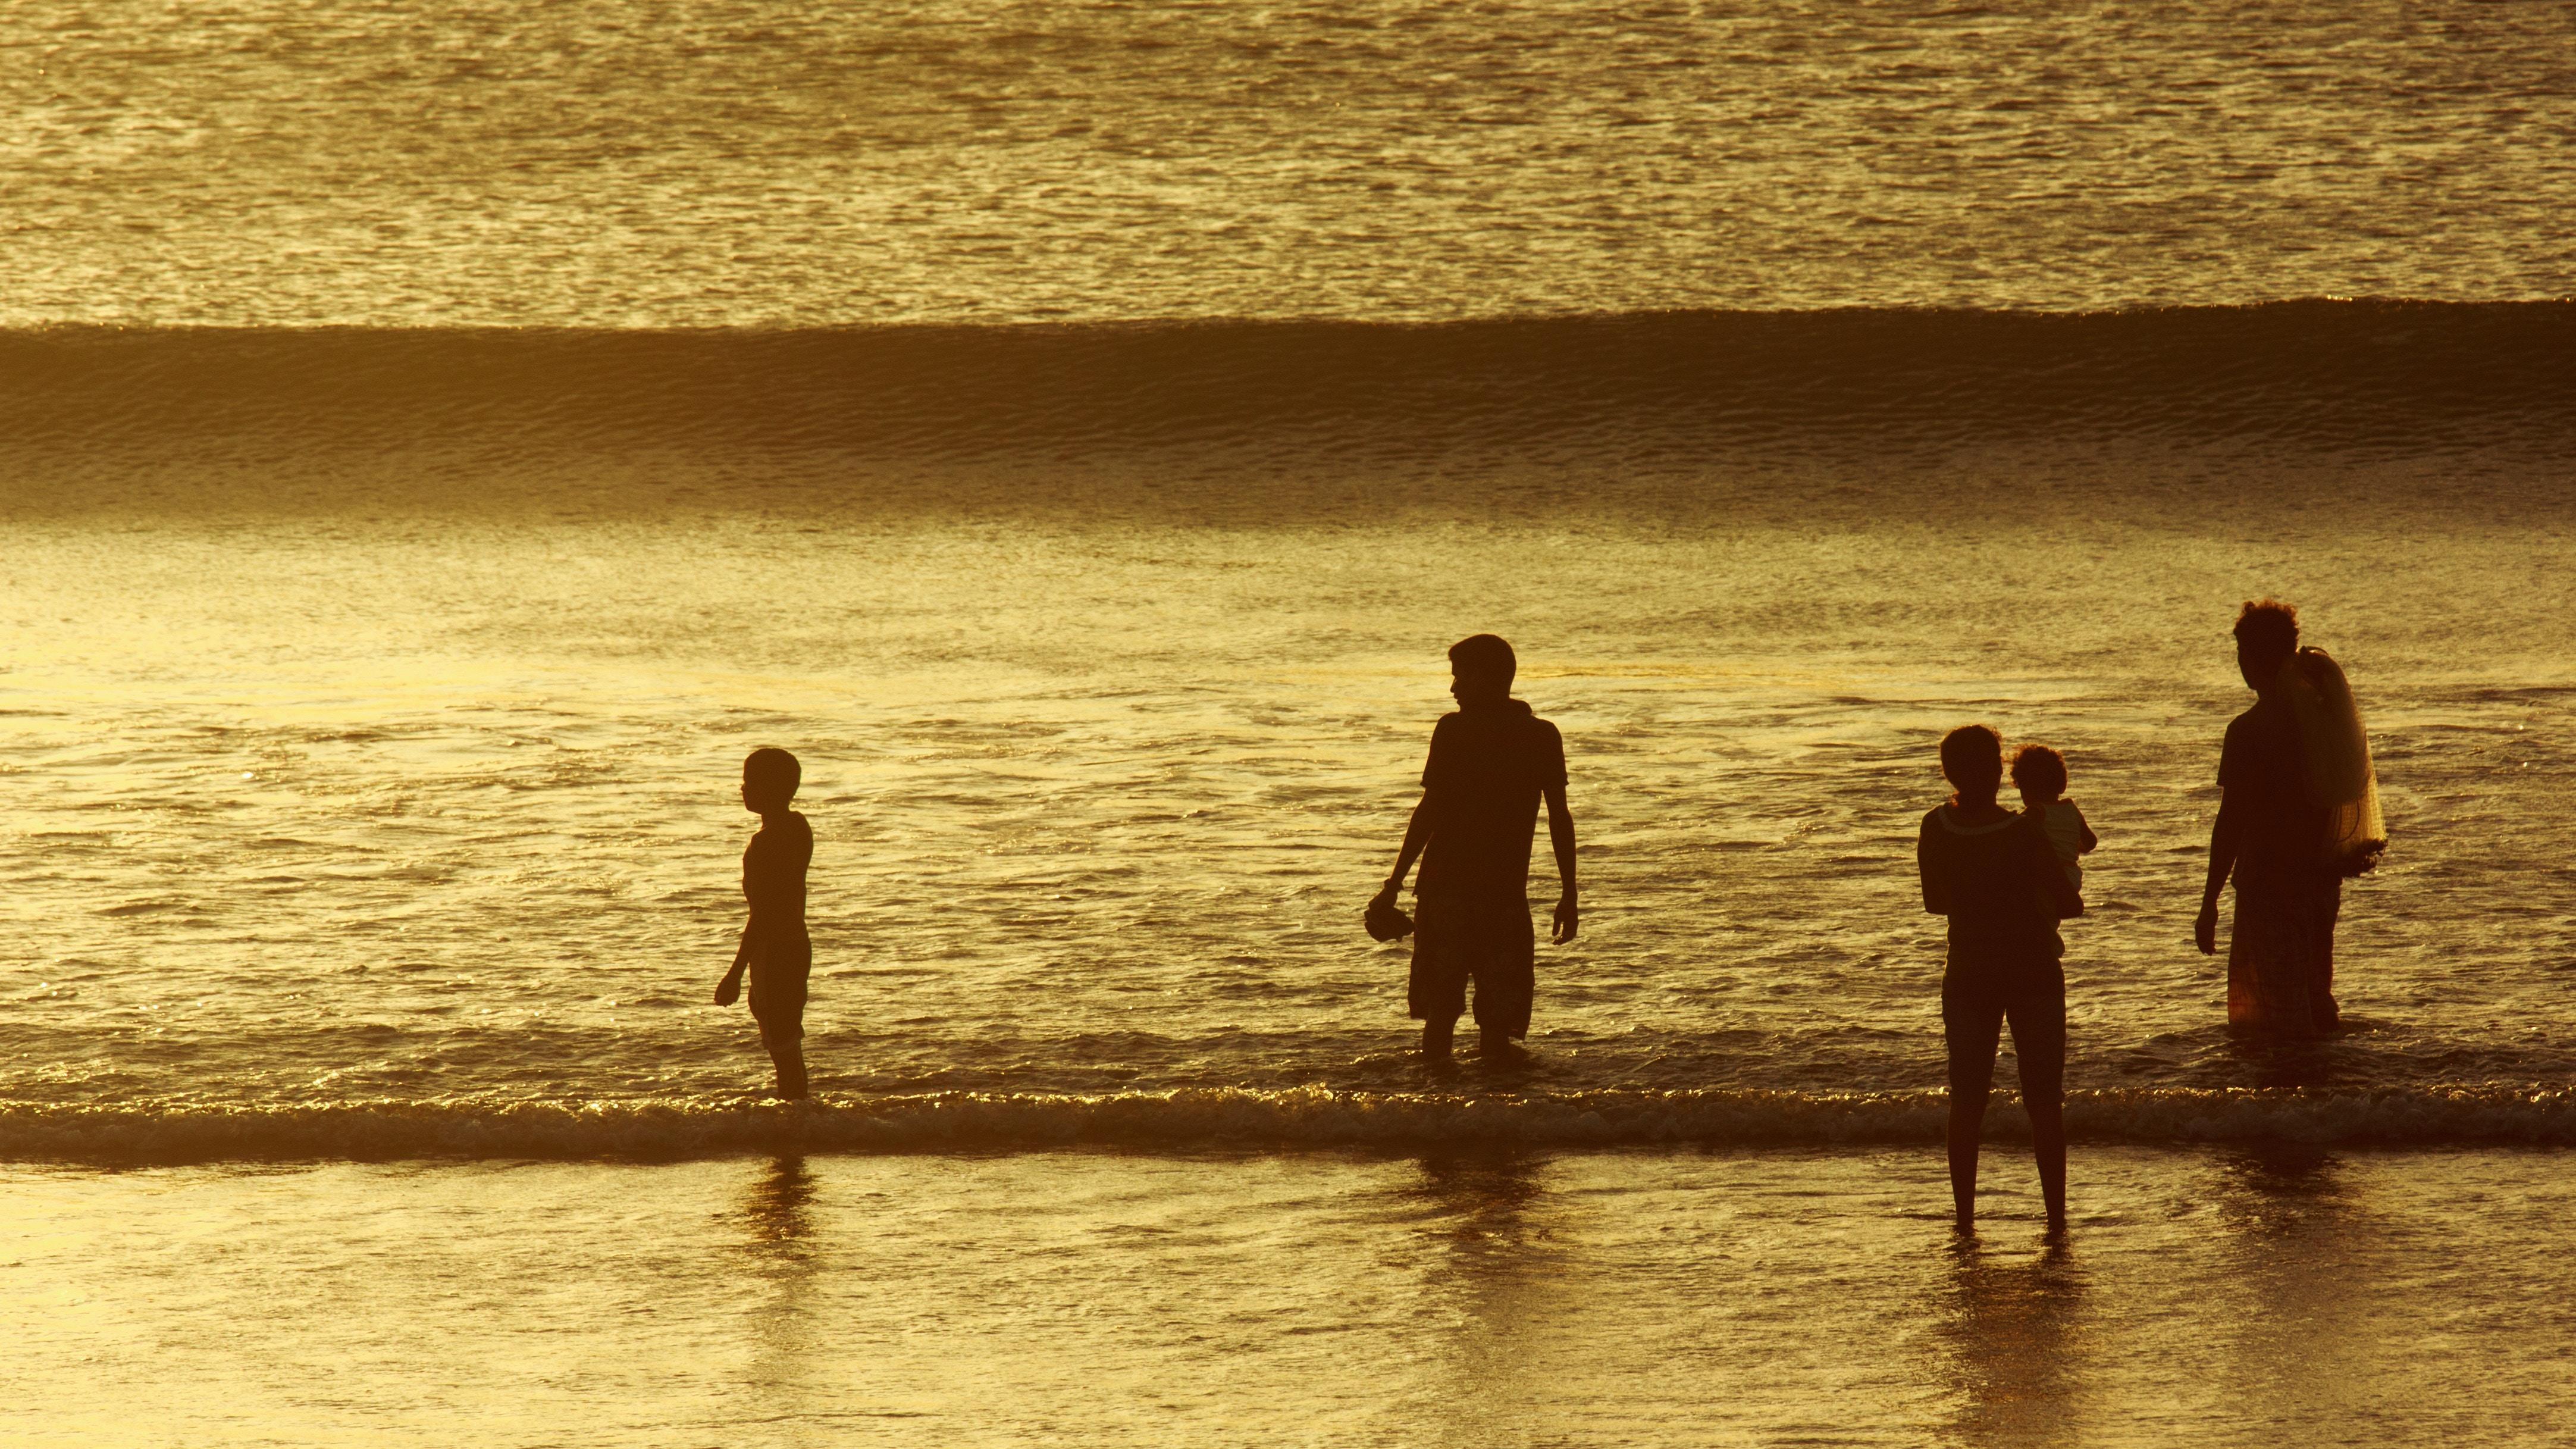 Väter, Mütter, Kind